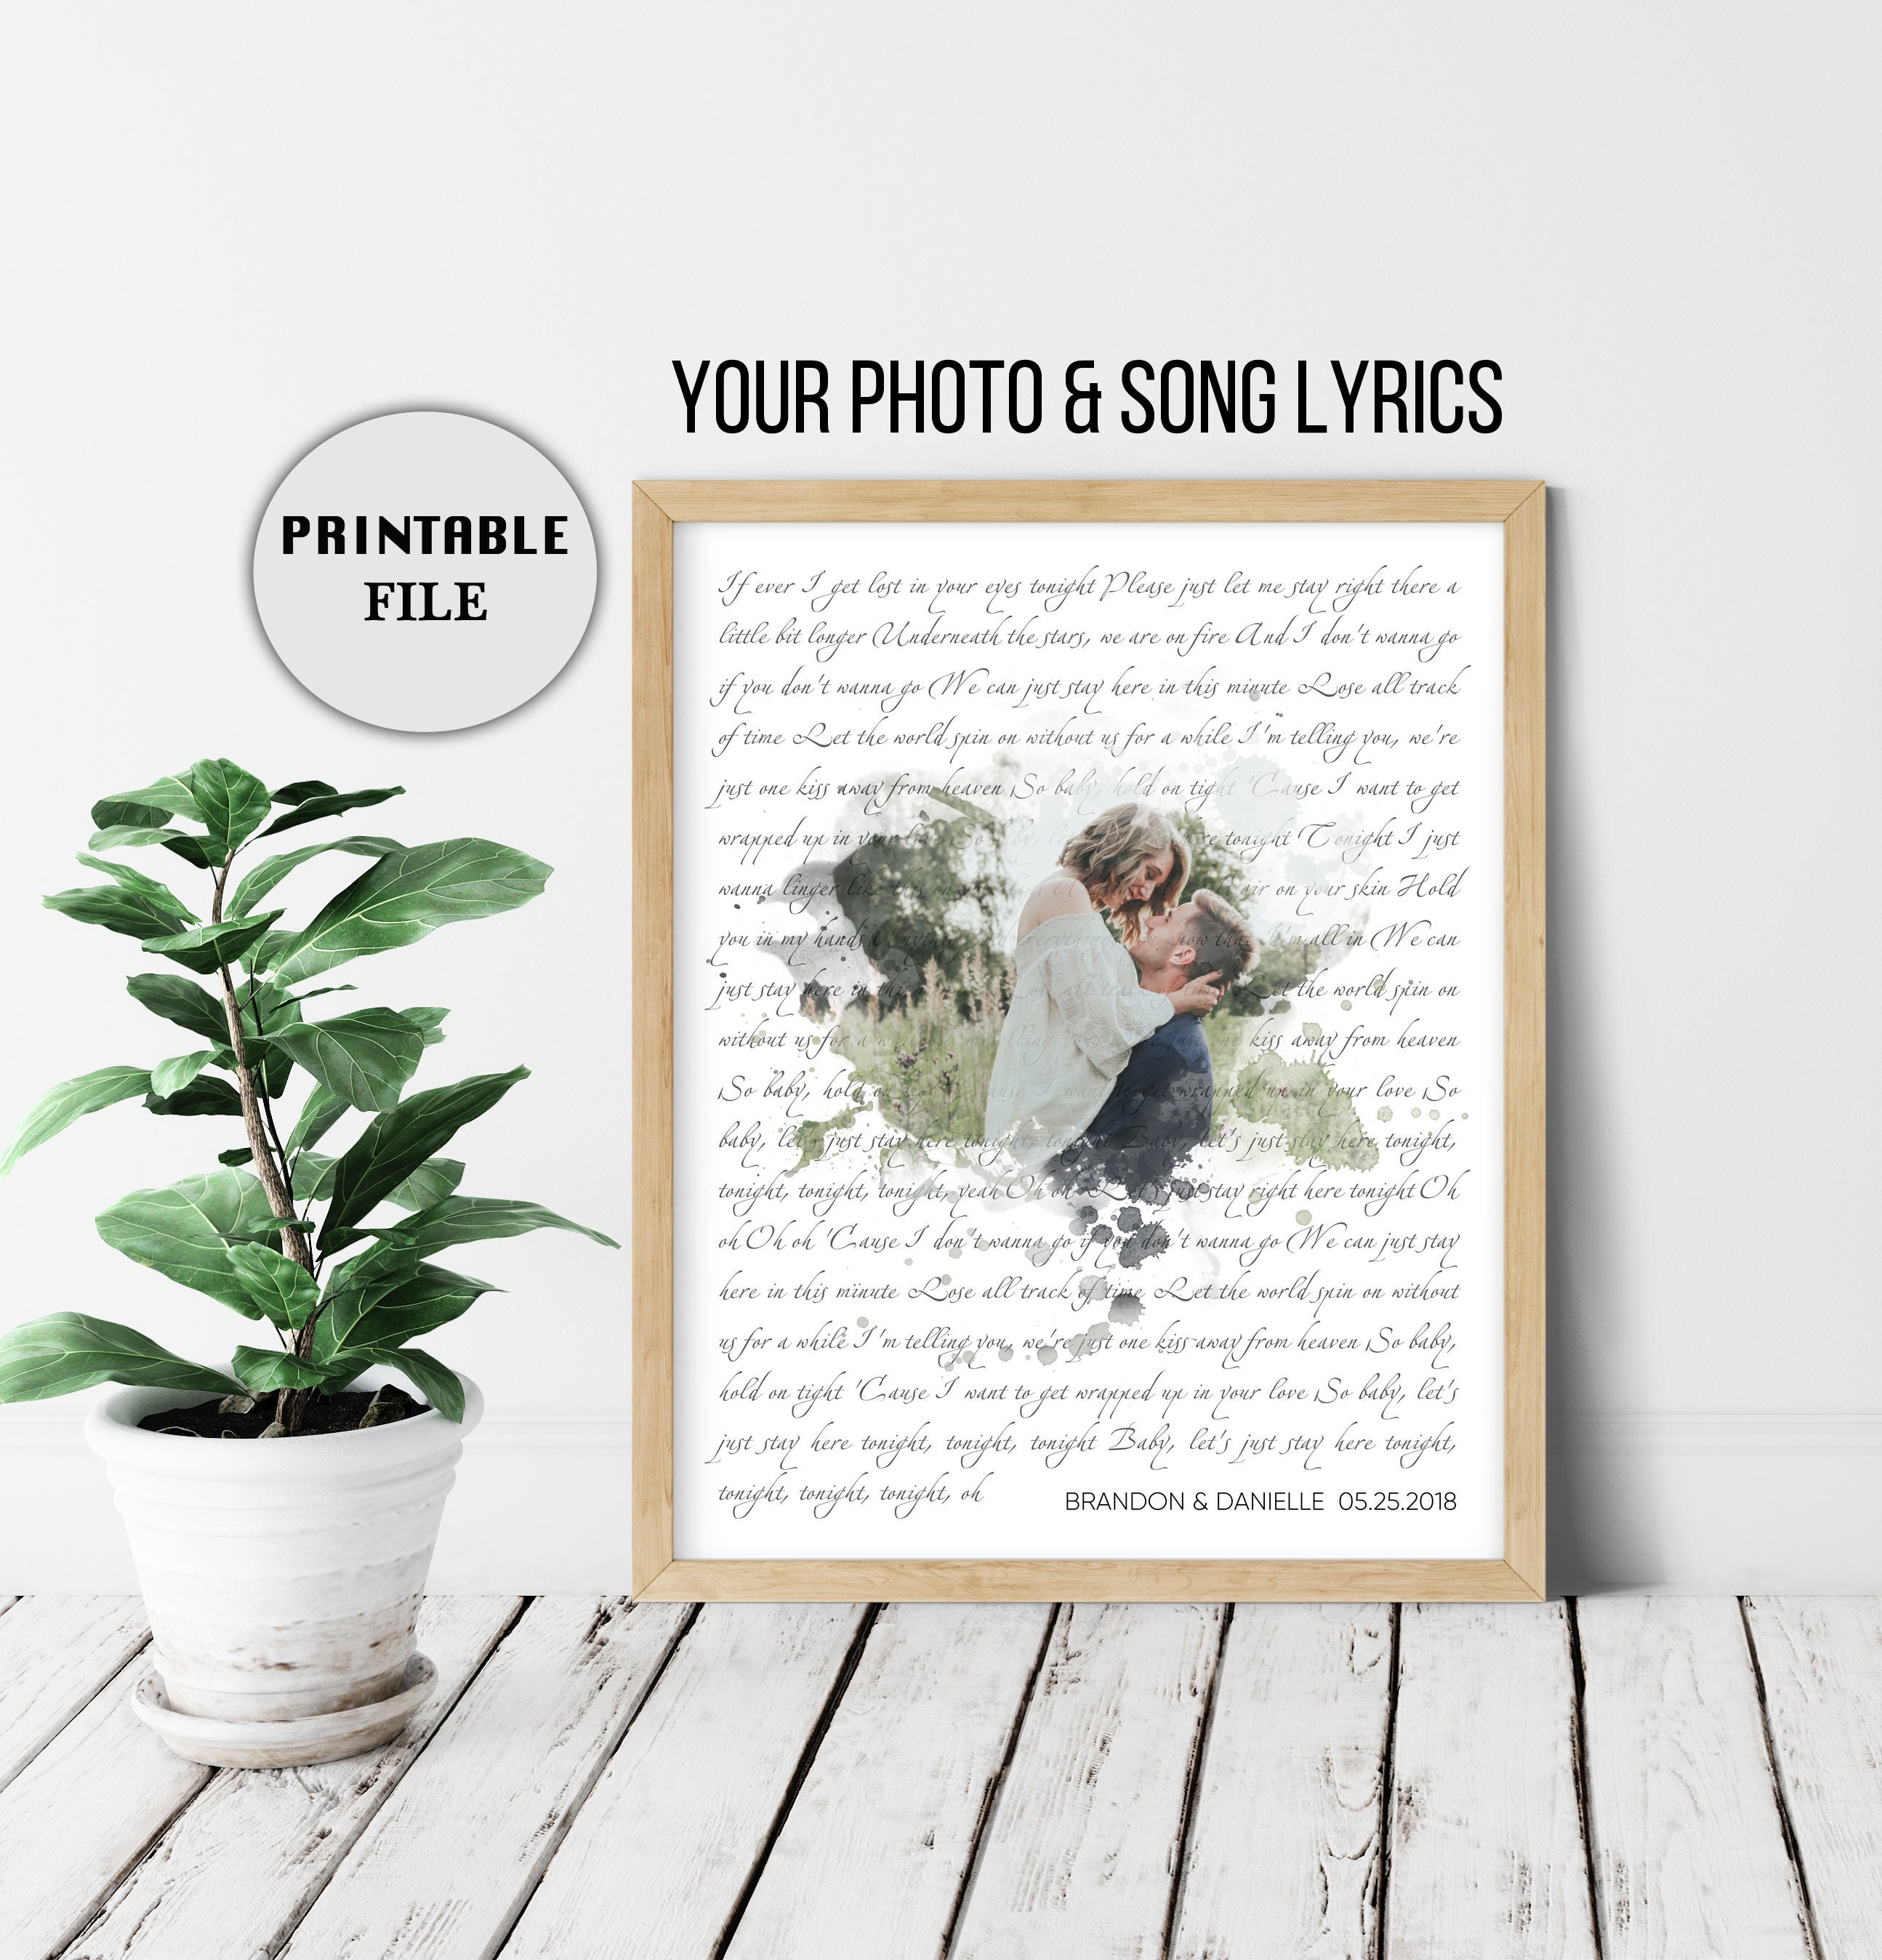 Custom Wedding Song Lyrics, 5 Year Anniversary Gifts for Men, Anniversary  Gifts for Men,Personalized Gift for Couple Lyrics DIGITAL DOWNLOAD